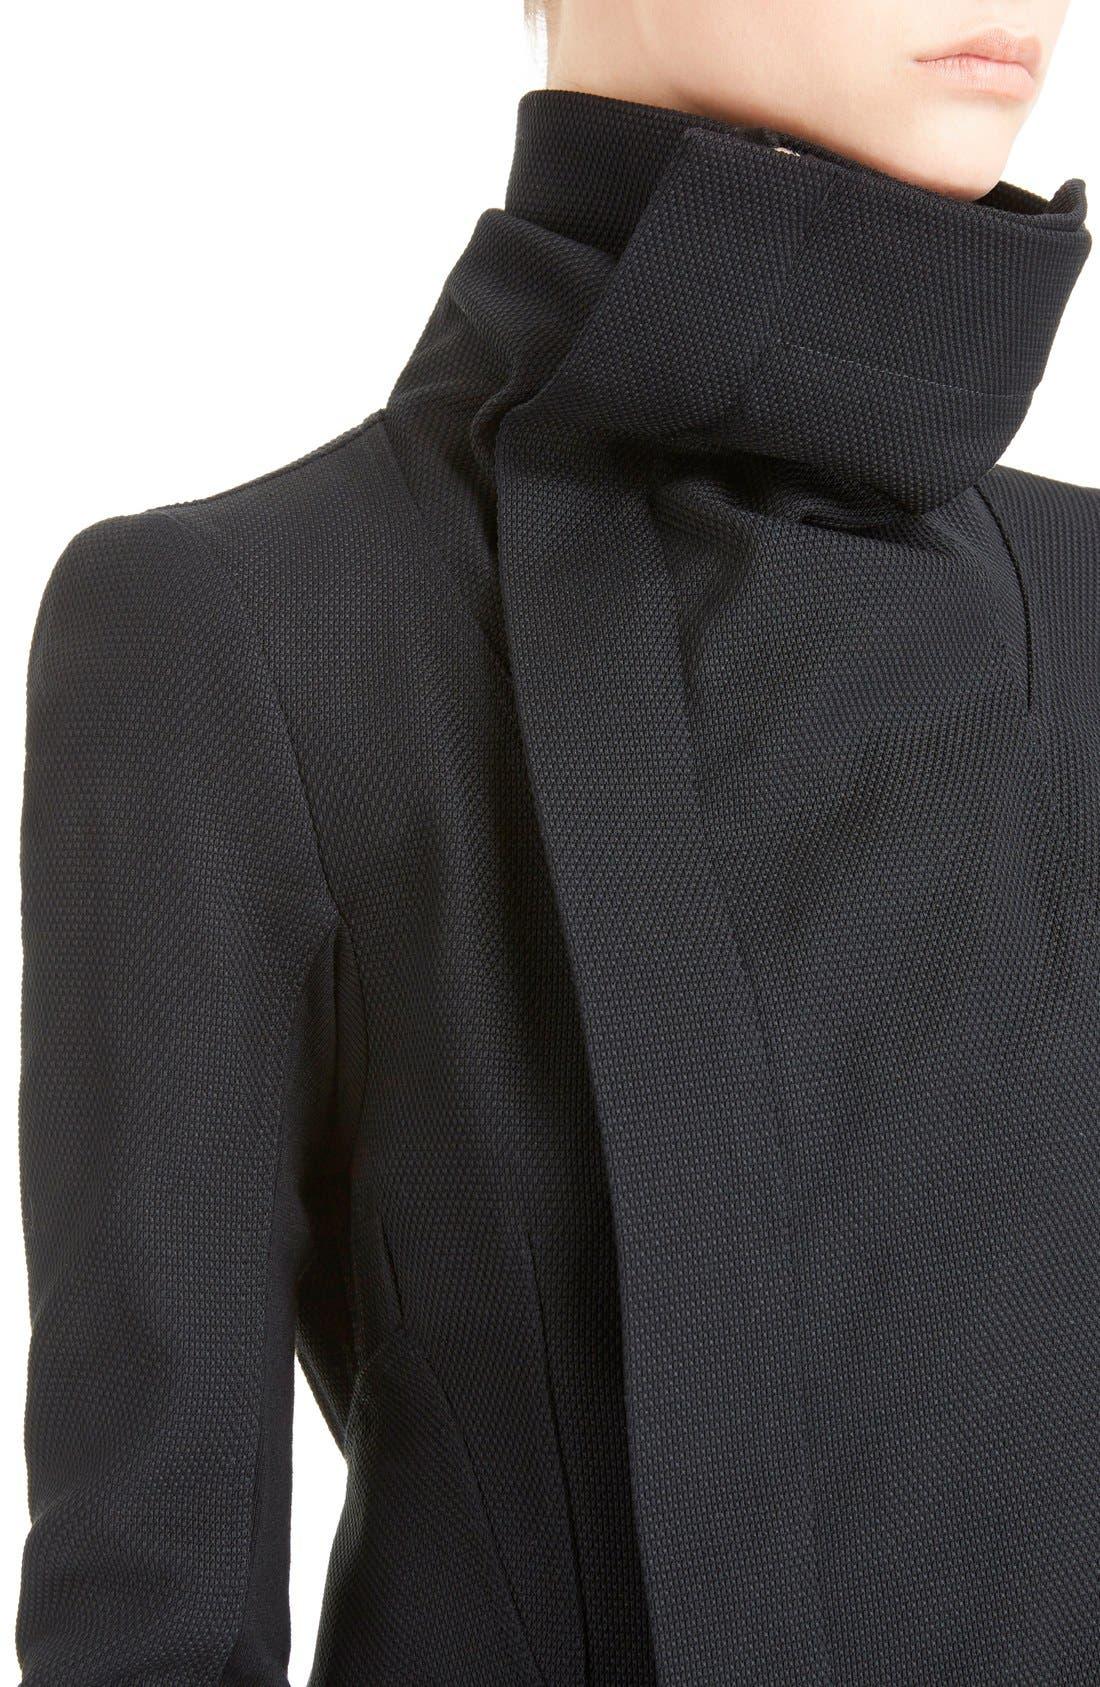 Stretch Cotton Biker Jacket,                             Alternate thumbnail 12, color,                             BLACK